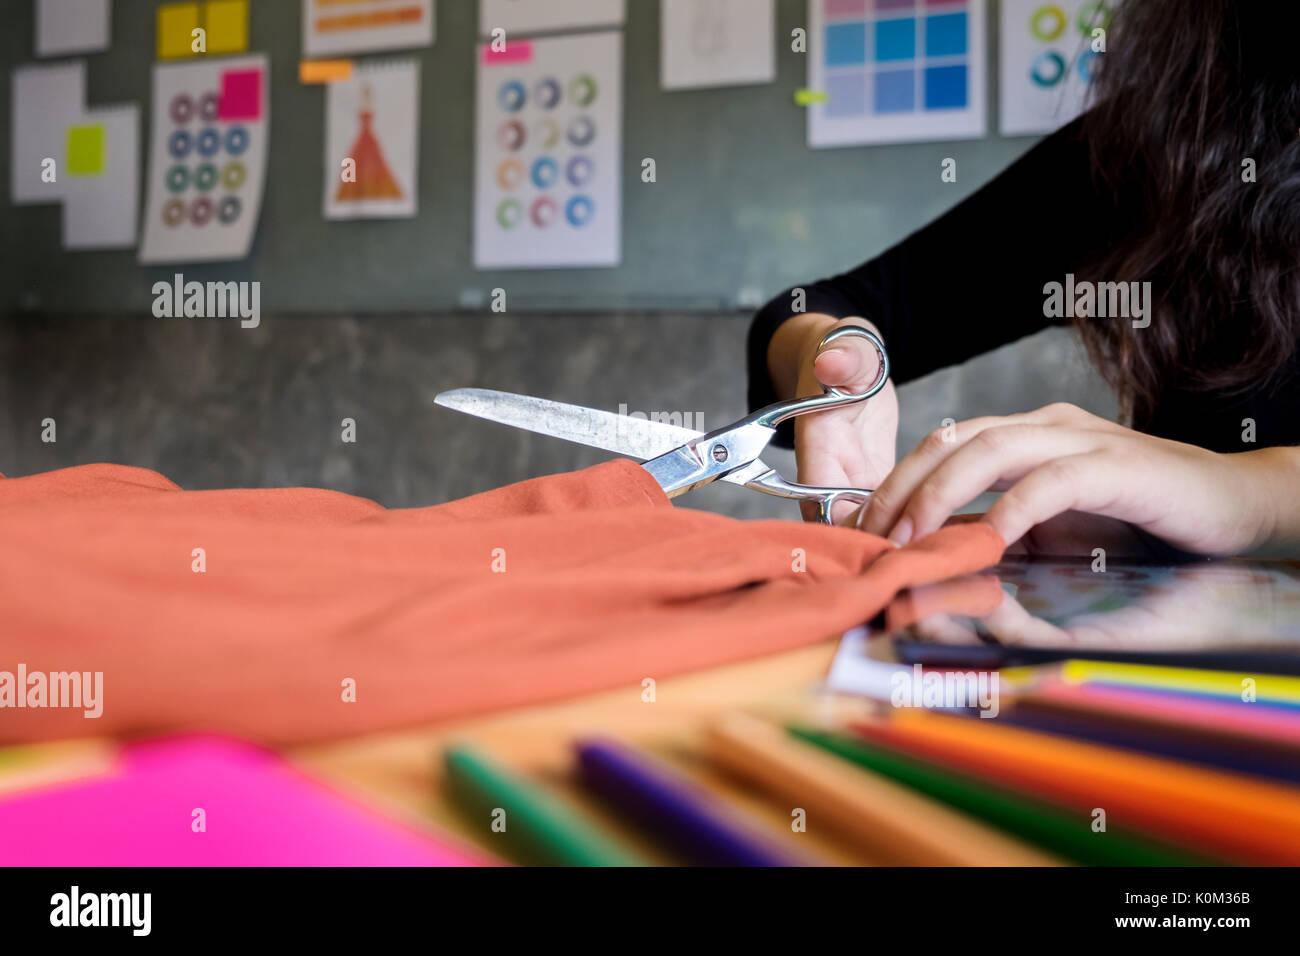 Hands notch tailor tailor's scissors cloth cutting a piece of fabric (fashion designer concept) Stock Photo